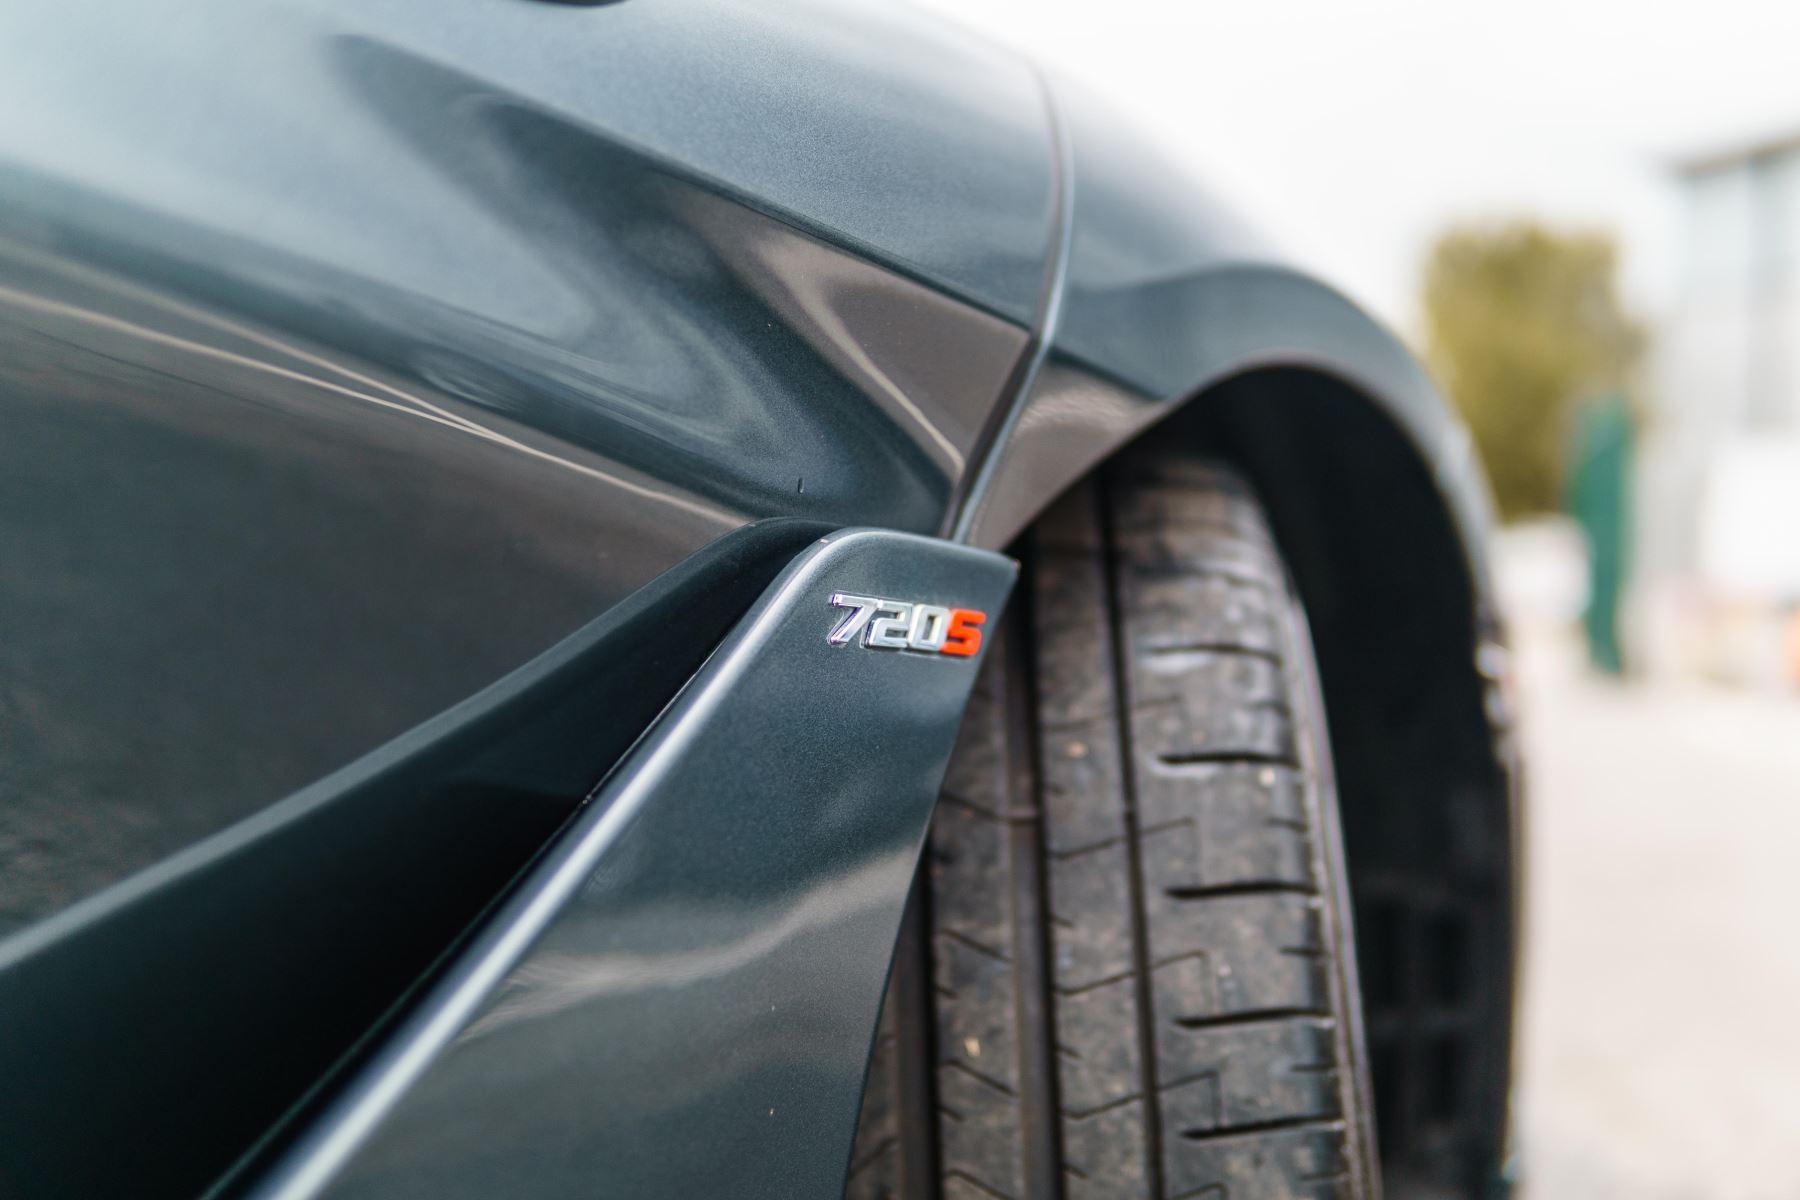 McLaren 720S Performance V8 Coupe SSG image 76